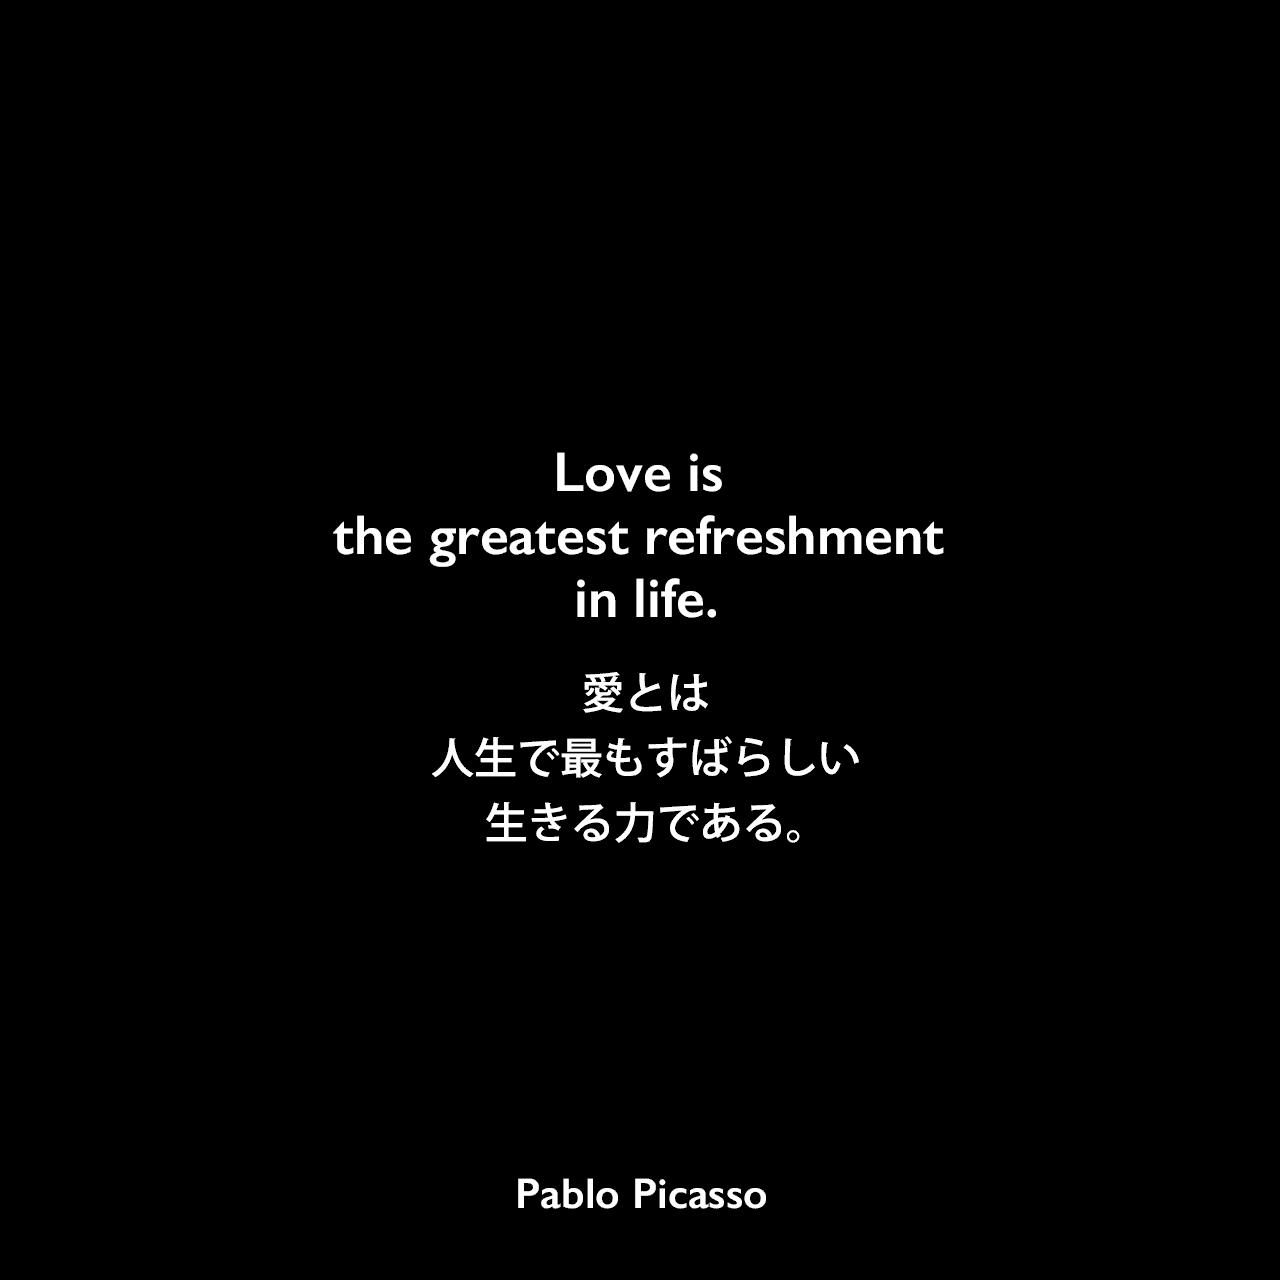 Love is the greatest refreshment in life.愛とは人生で最もすばらしい生きる力である。Pablo Picasso